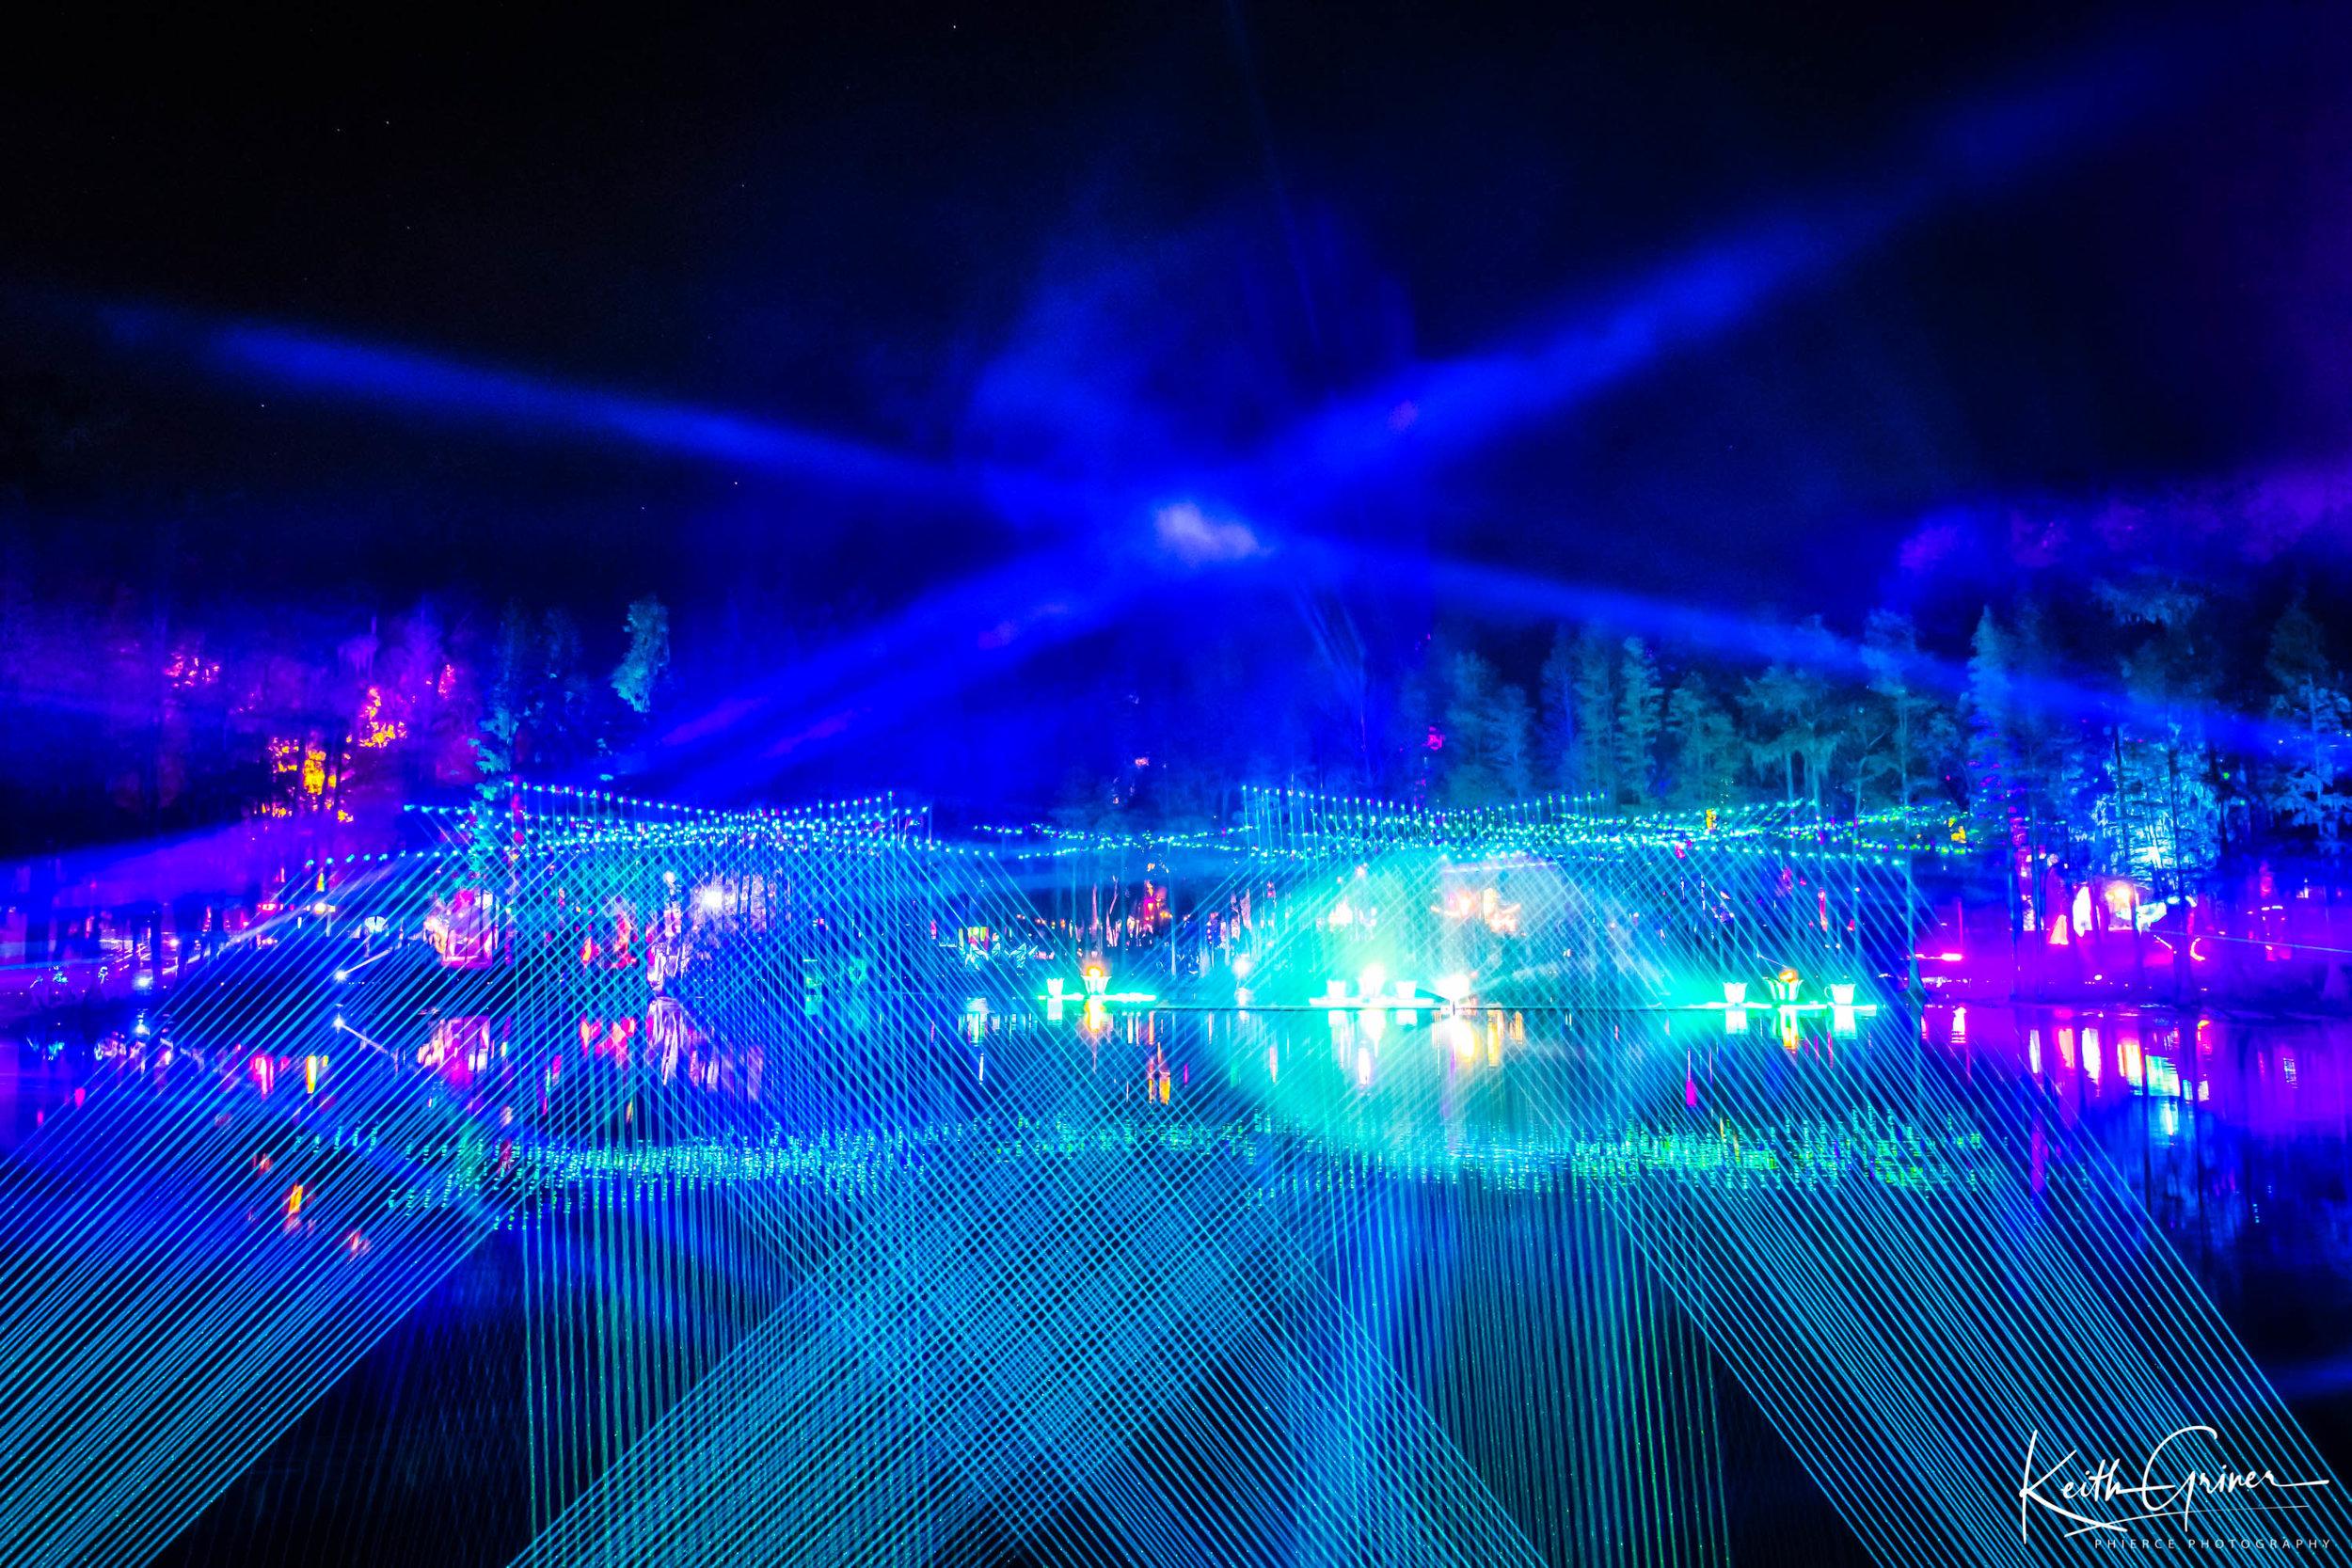 Hula_Spirit Lake_by Keith Griner 0D5_3345-Edit.jpg